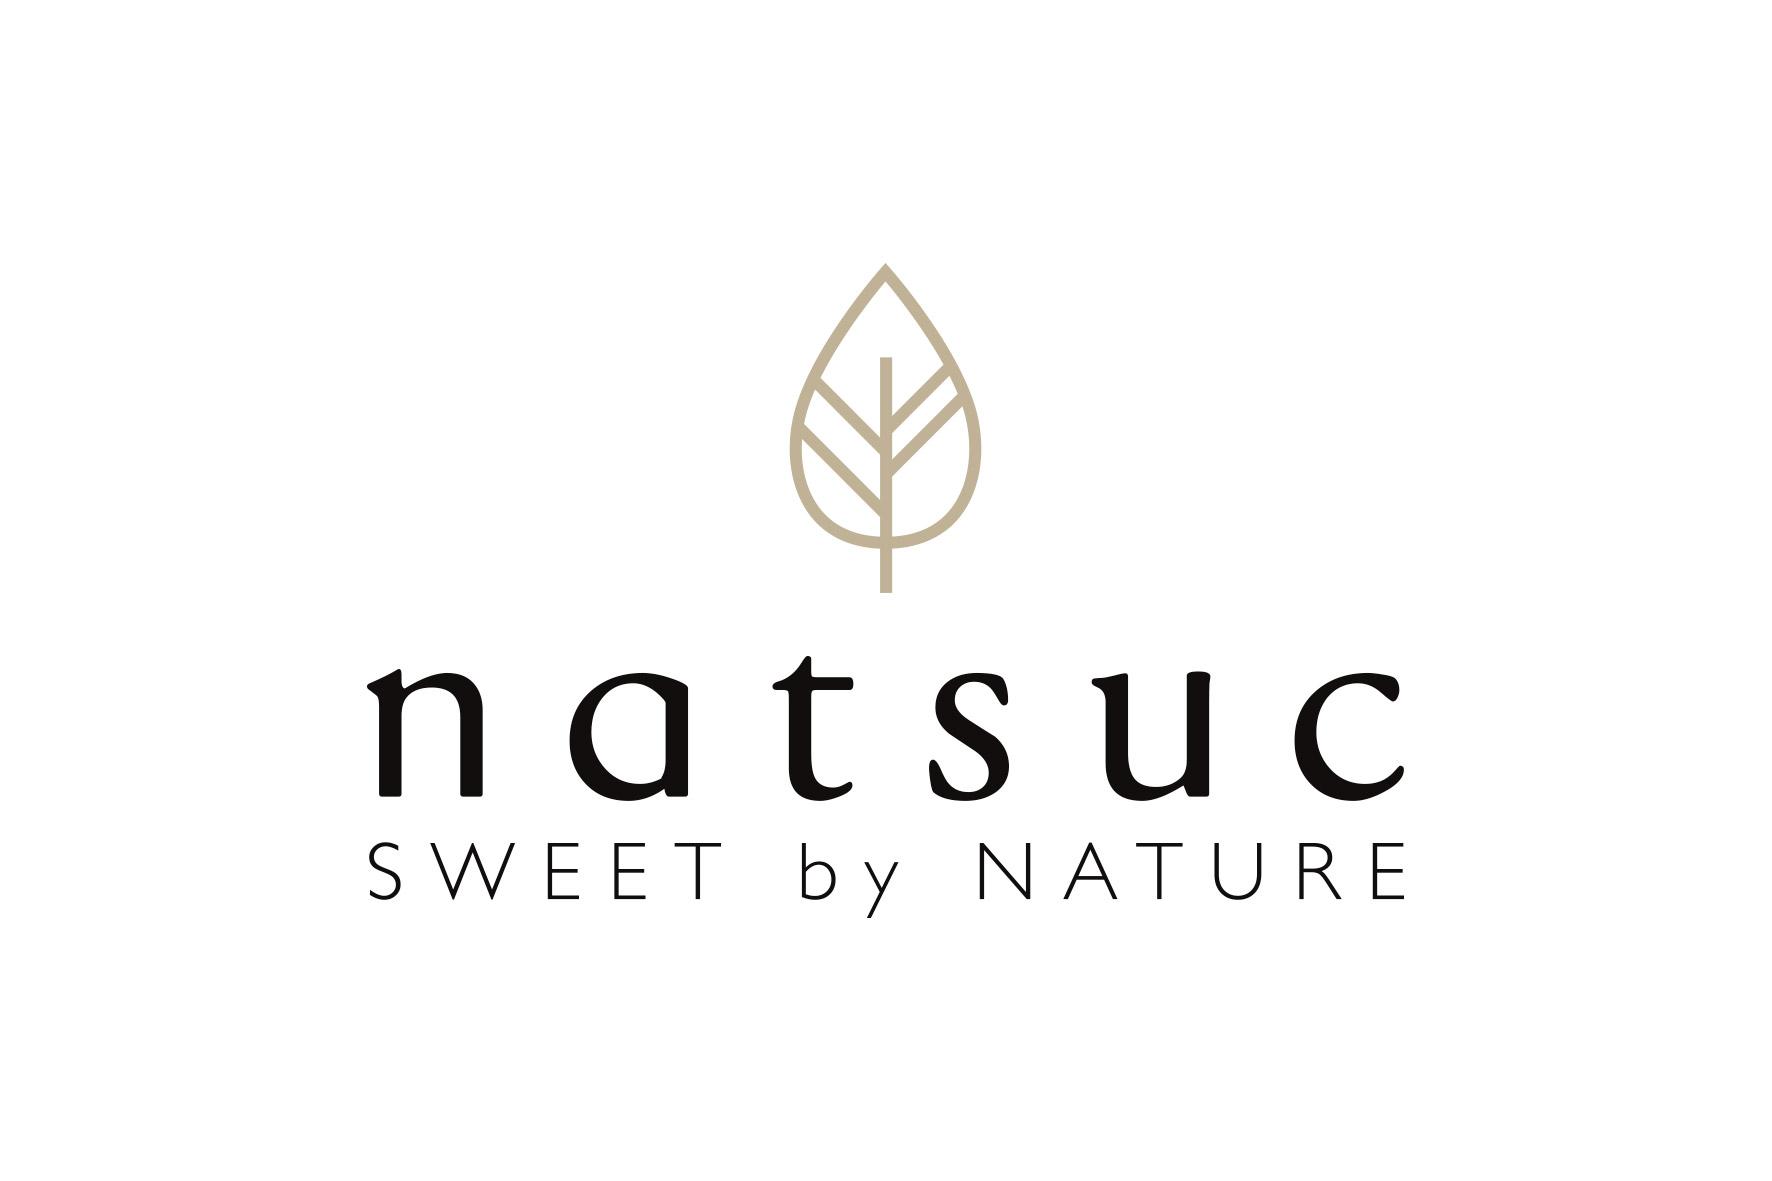 NatSuc-Vertical.jpg